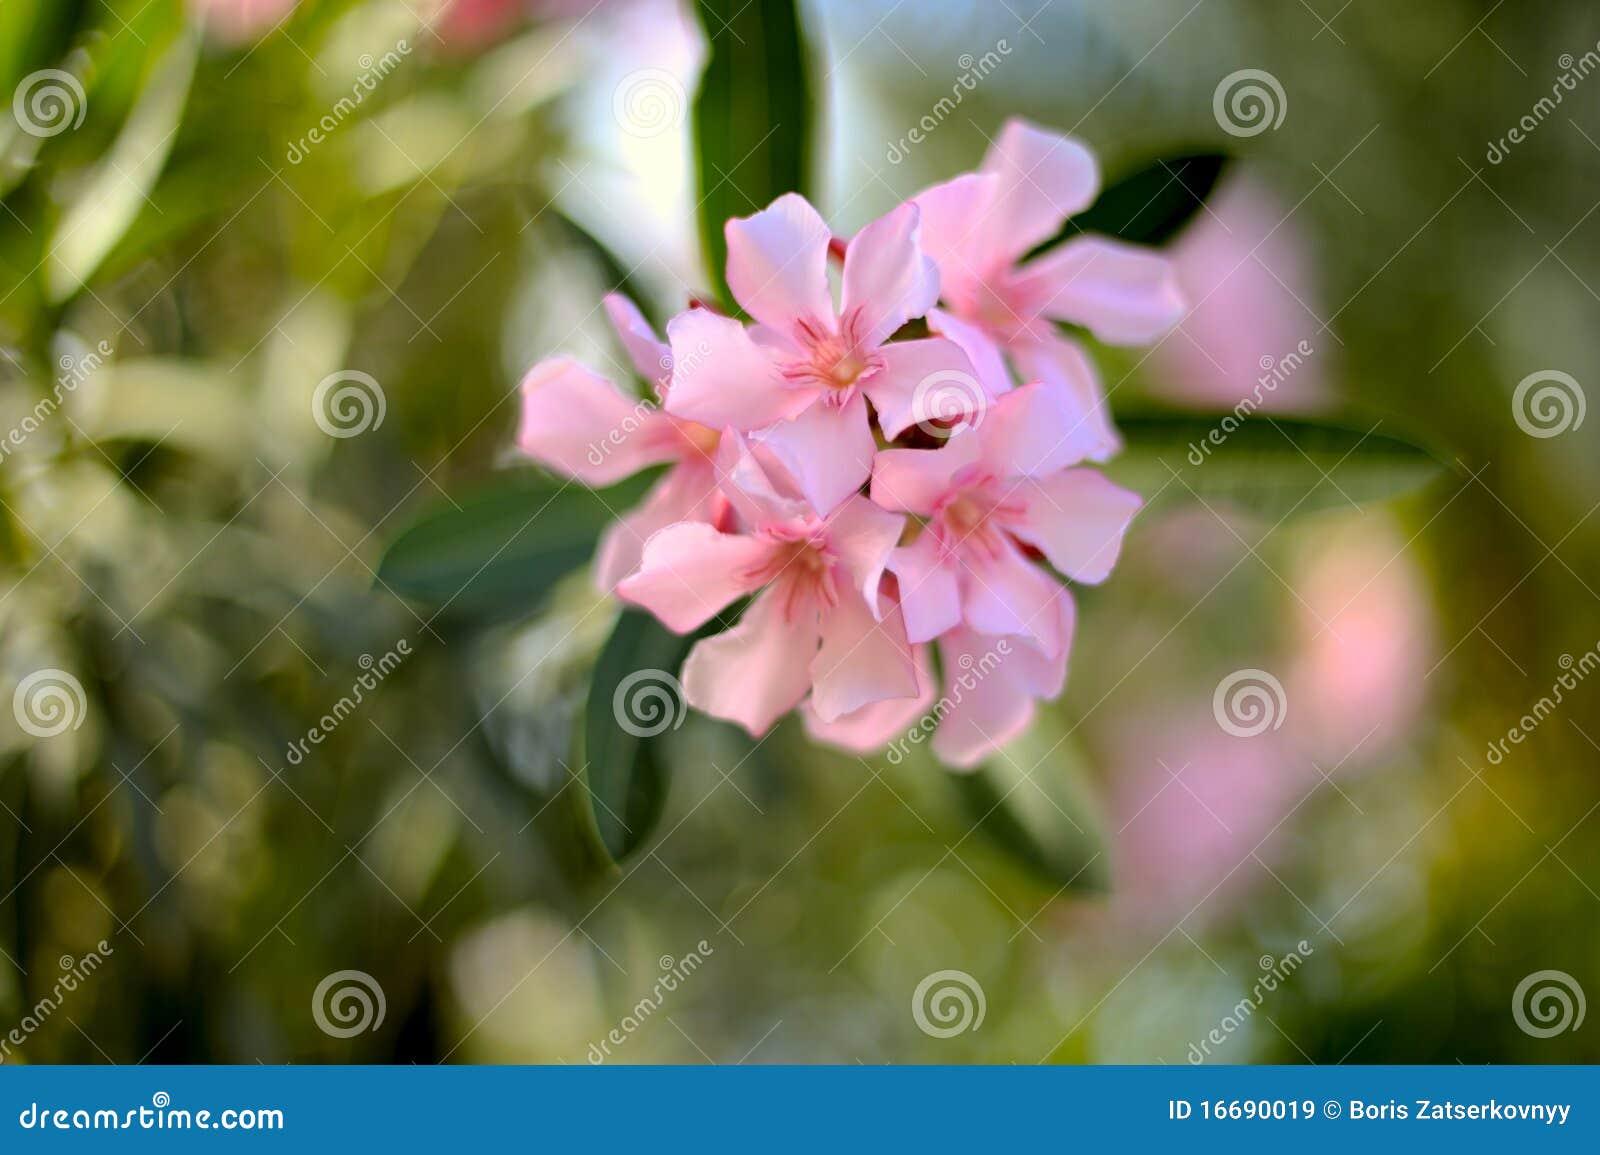 nerium oleander stock image image of beauty closeup 16690019